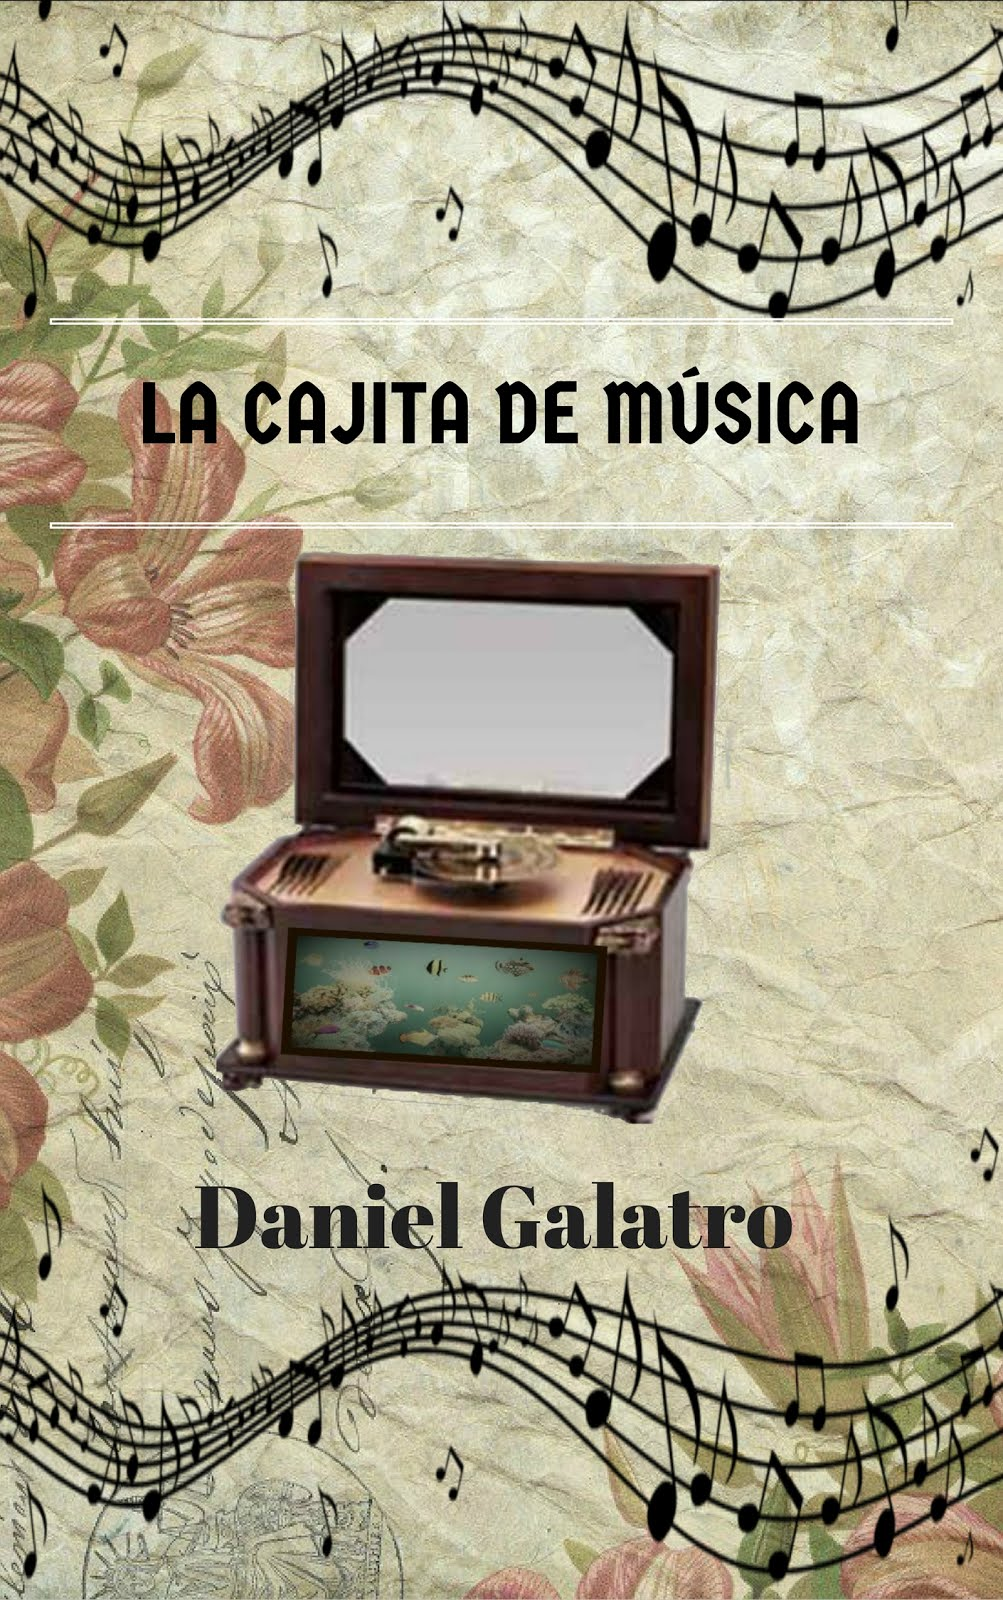 La cajita de música